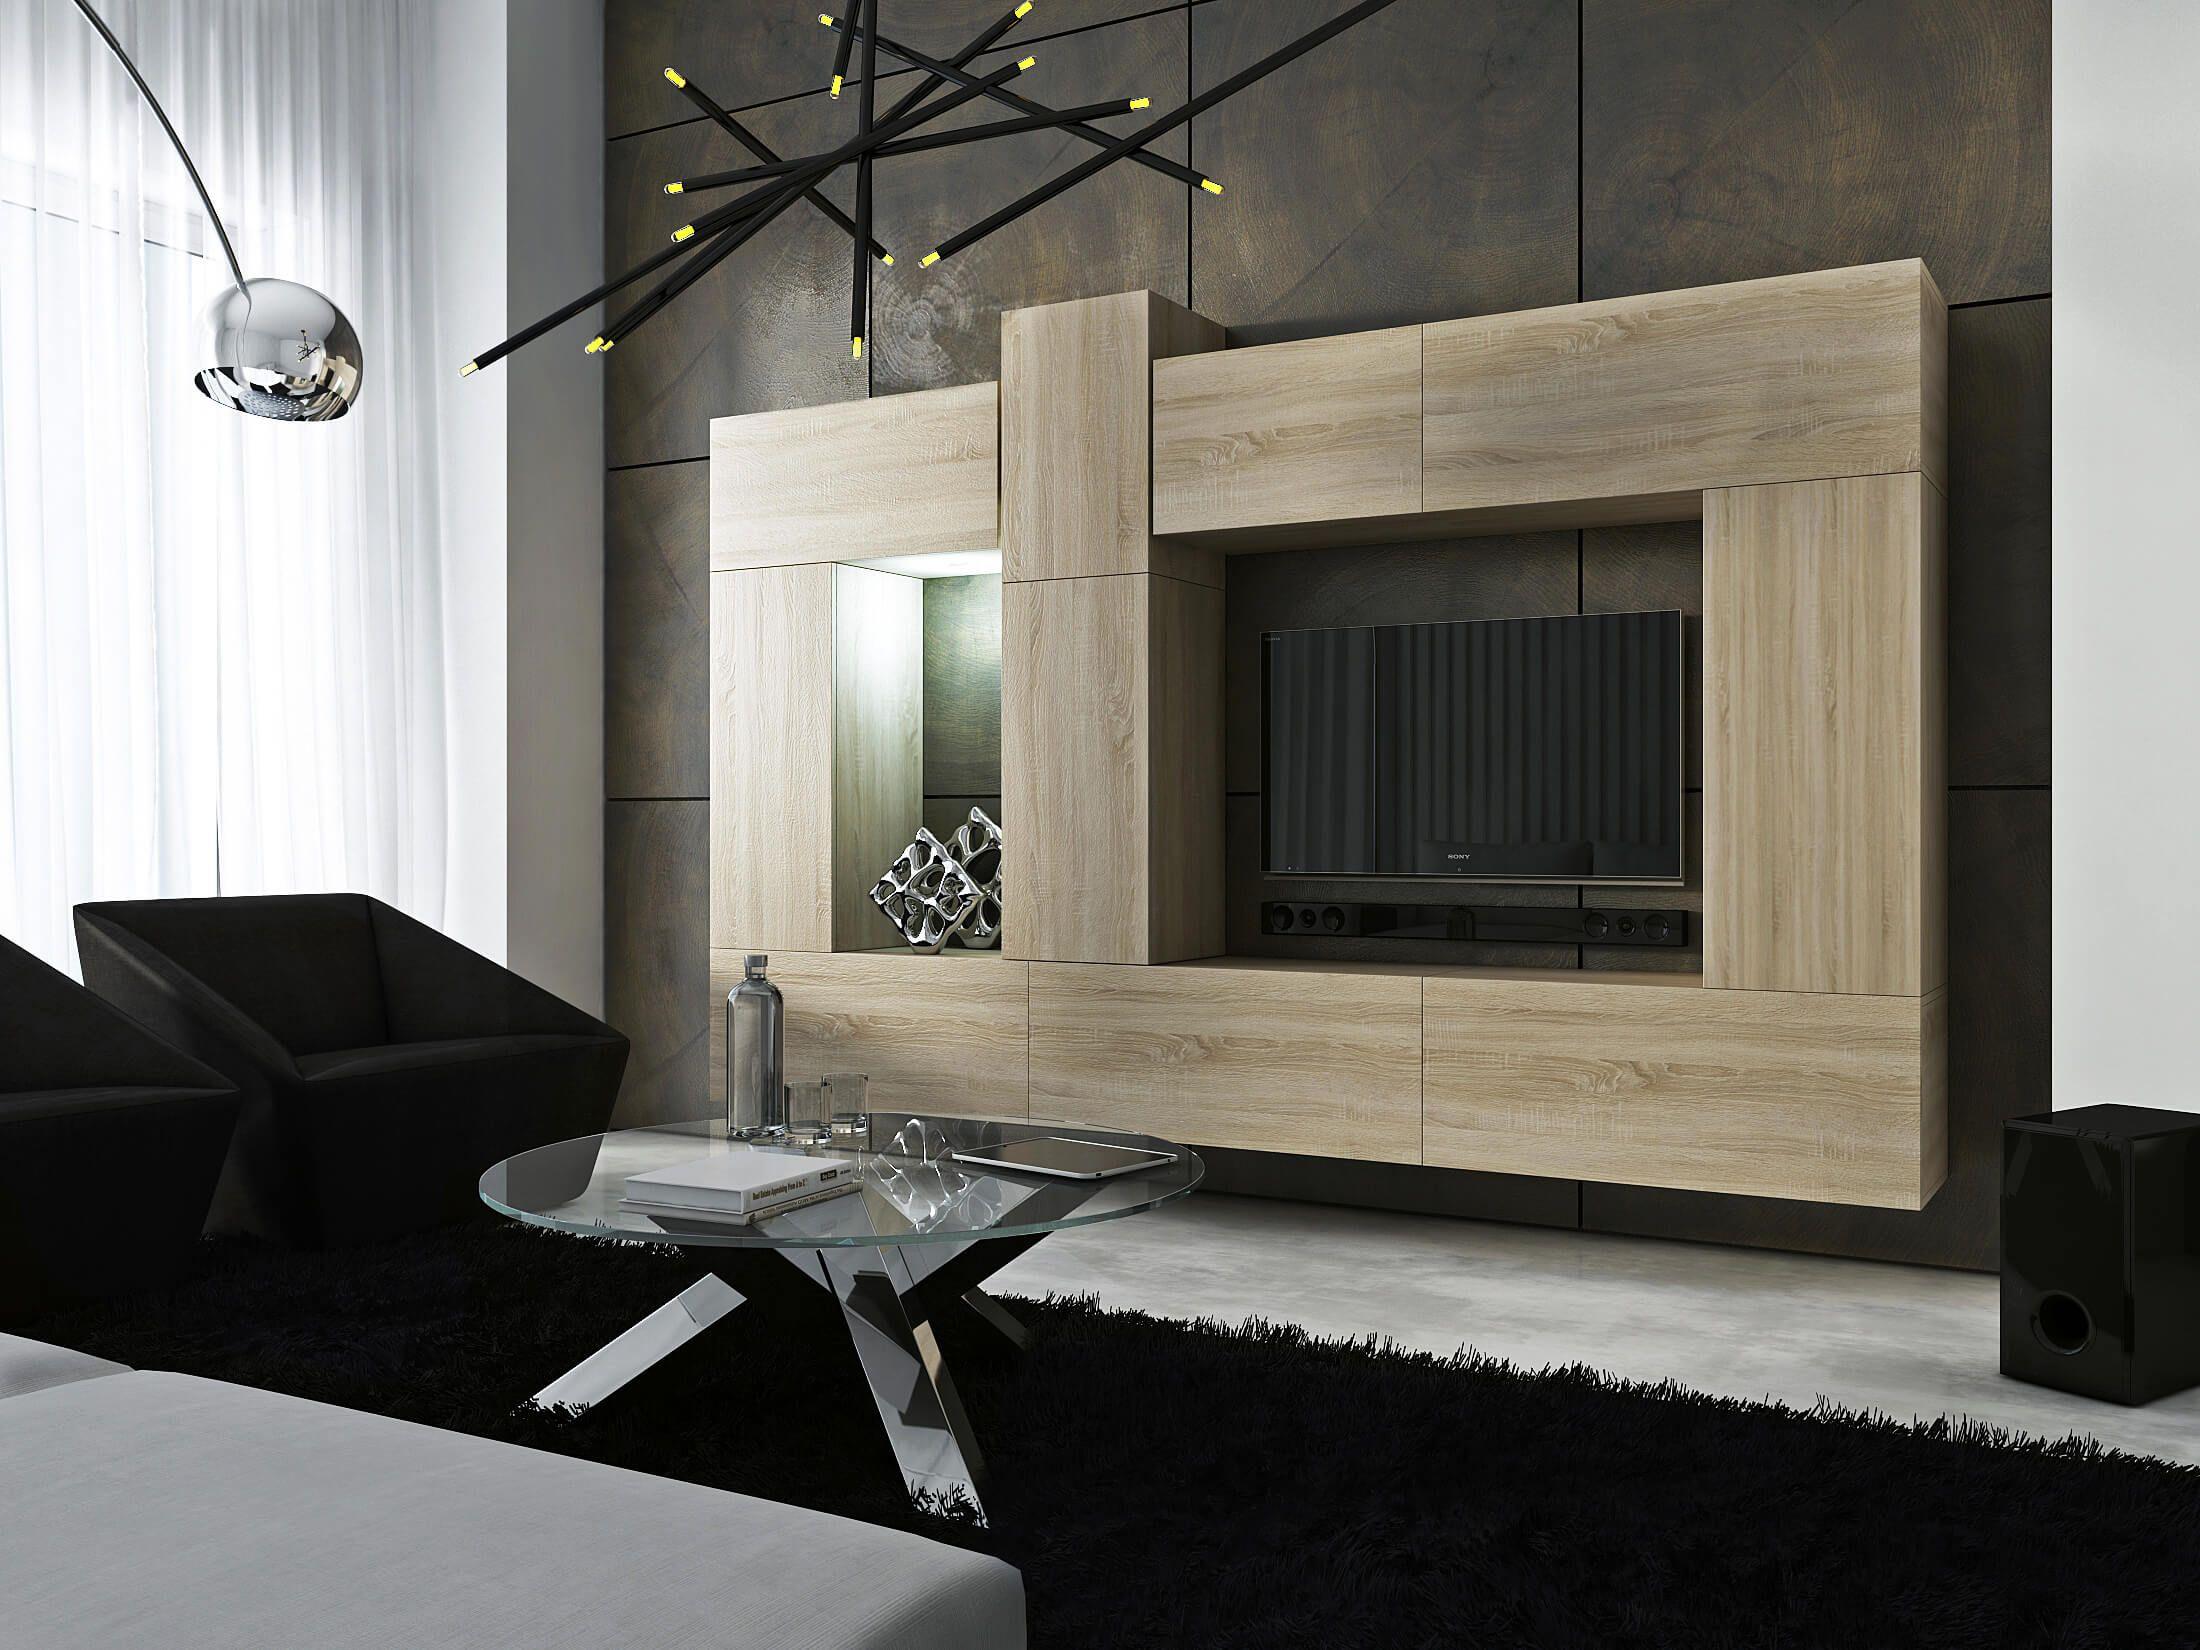 Mueble de sal³n SIZE sonoma – Prime Home Muebles Hogar icina